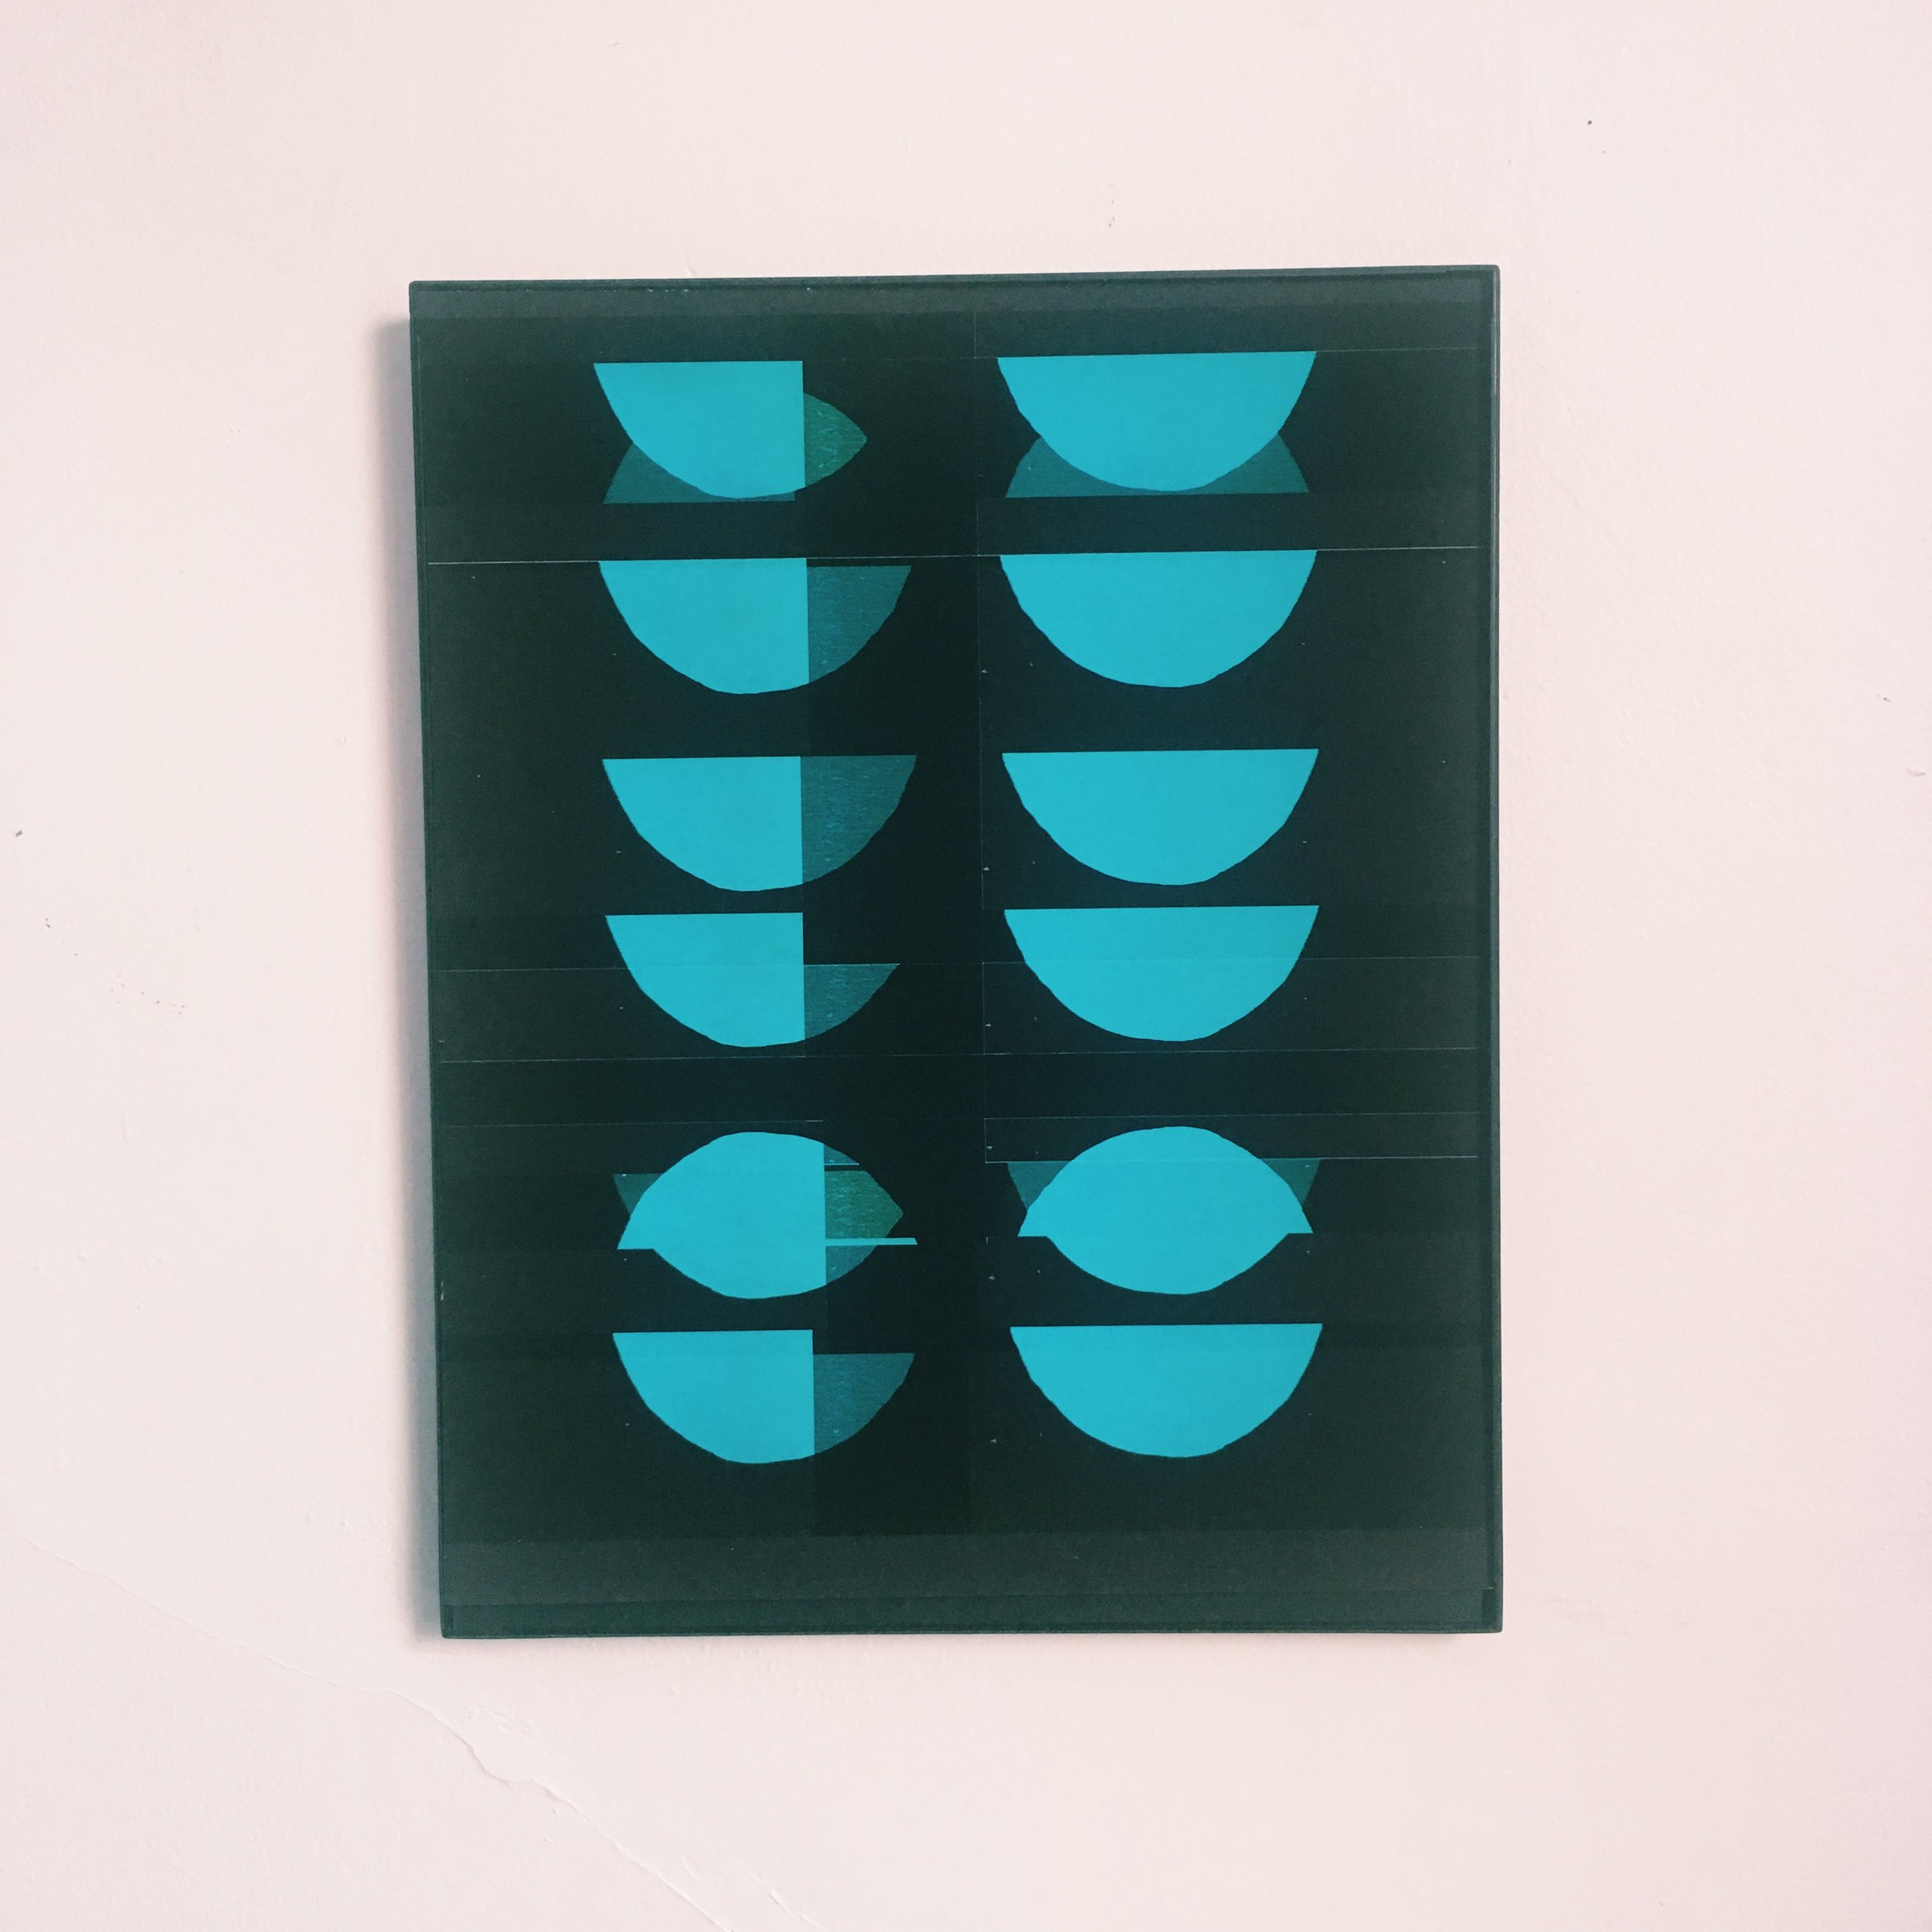 "Half Dreaming, Half Awake, 11x14"" digital print on fine art paper"